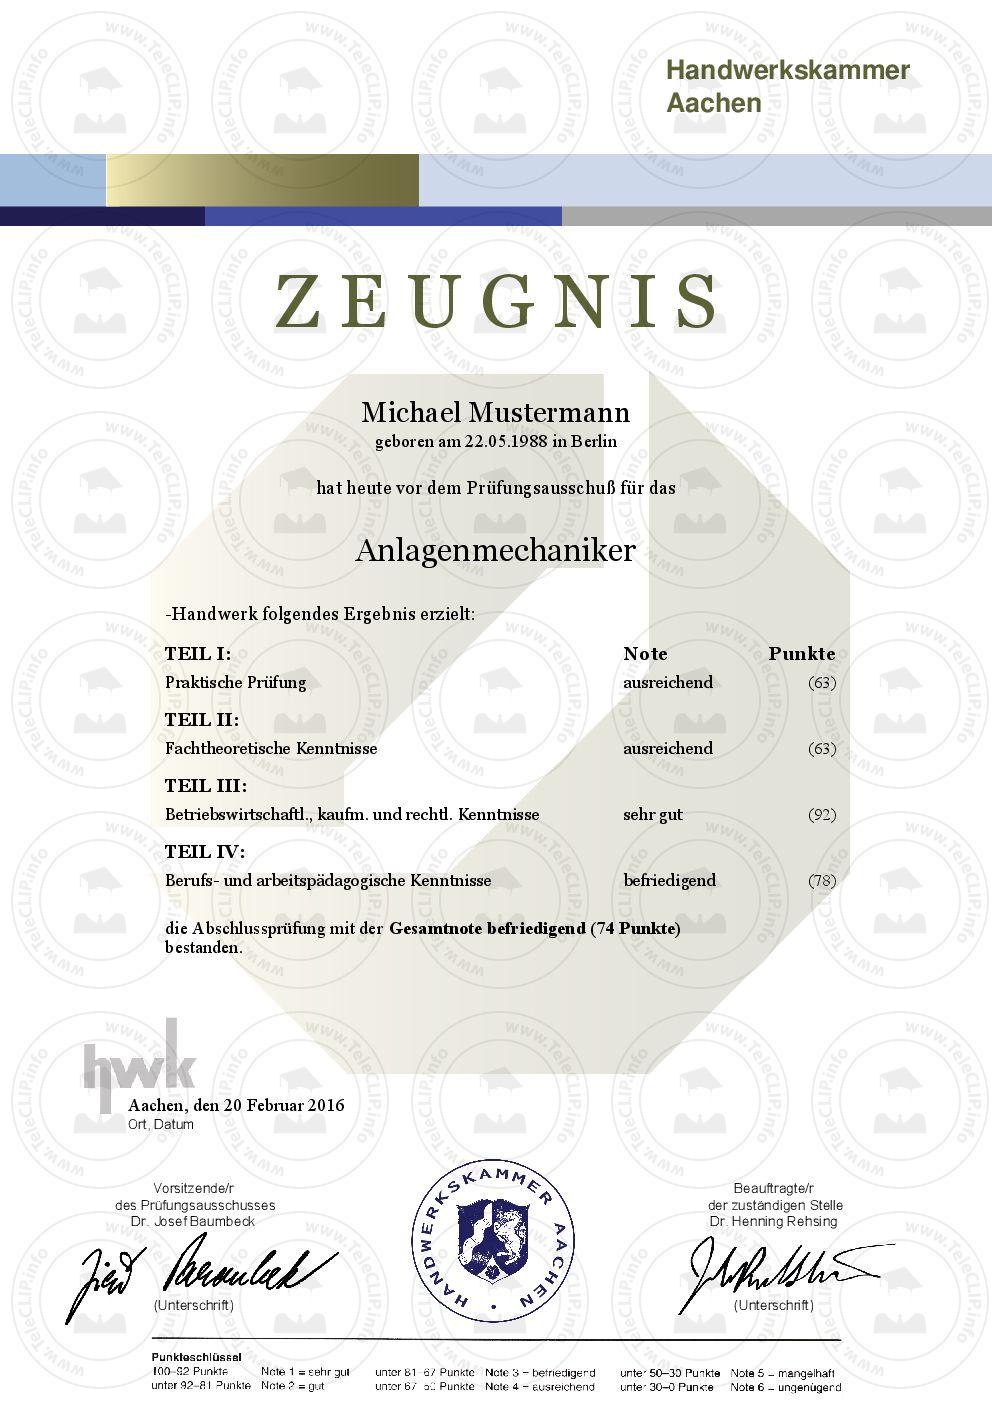 Professionelle Dokumente – Individuelle Urkunden & Zertifikate ...